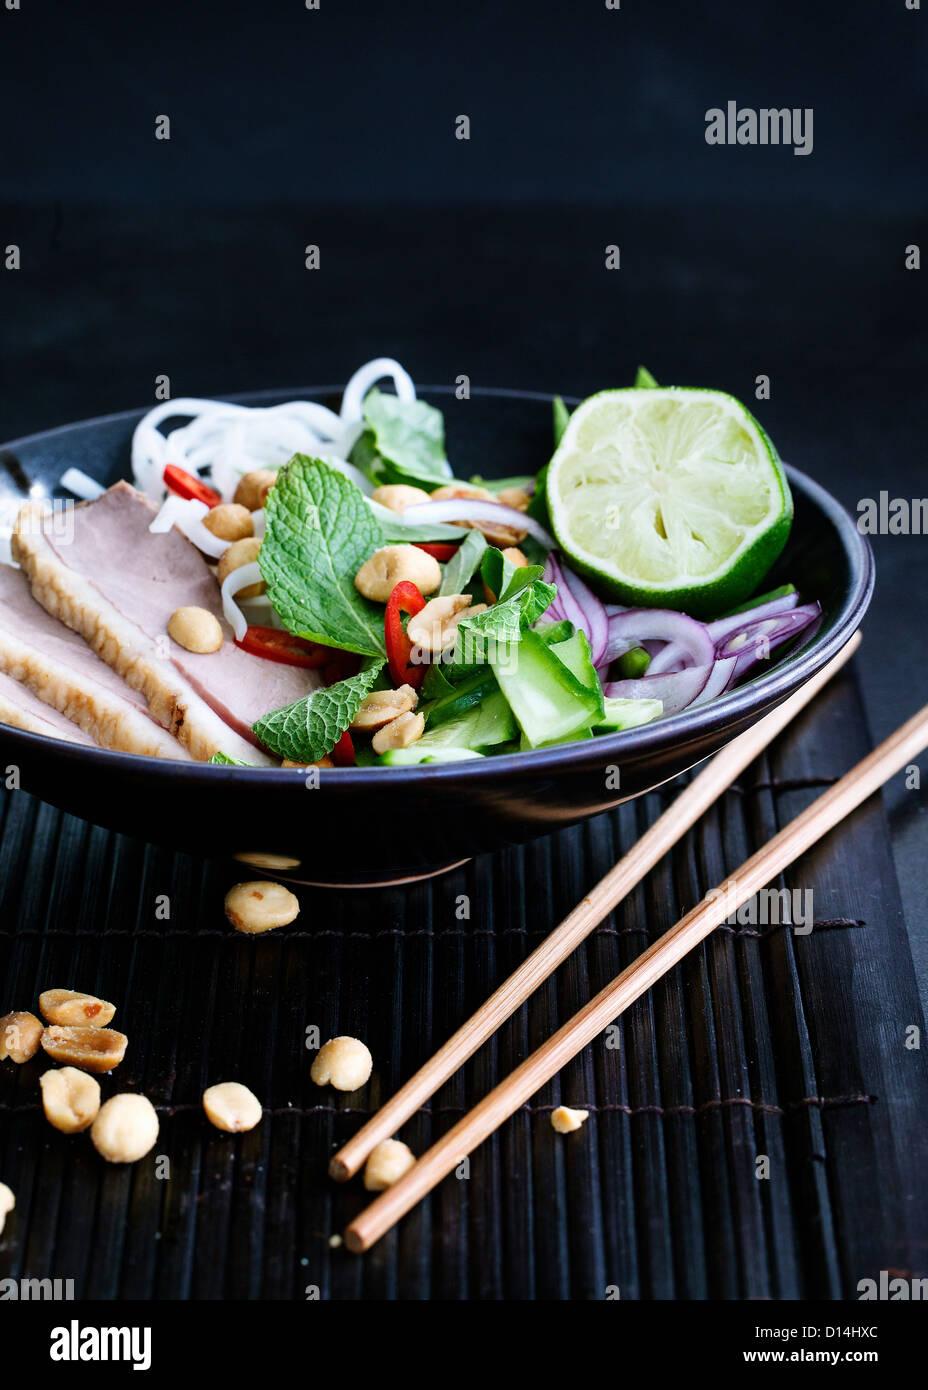 Plate of Vietnamese duck salad - Stock Image